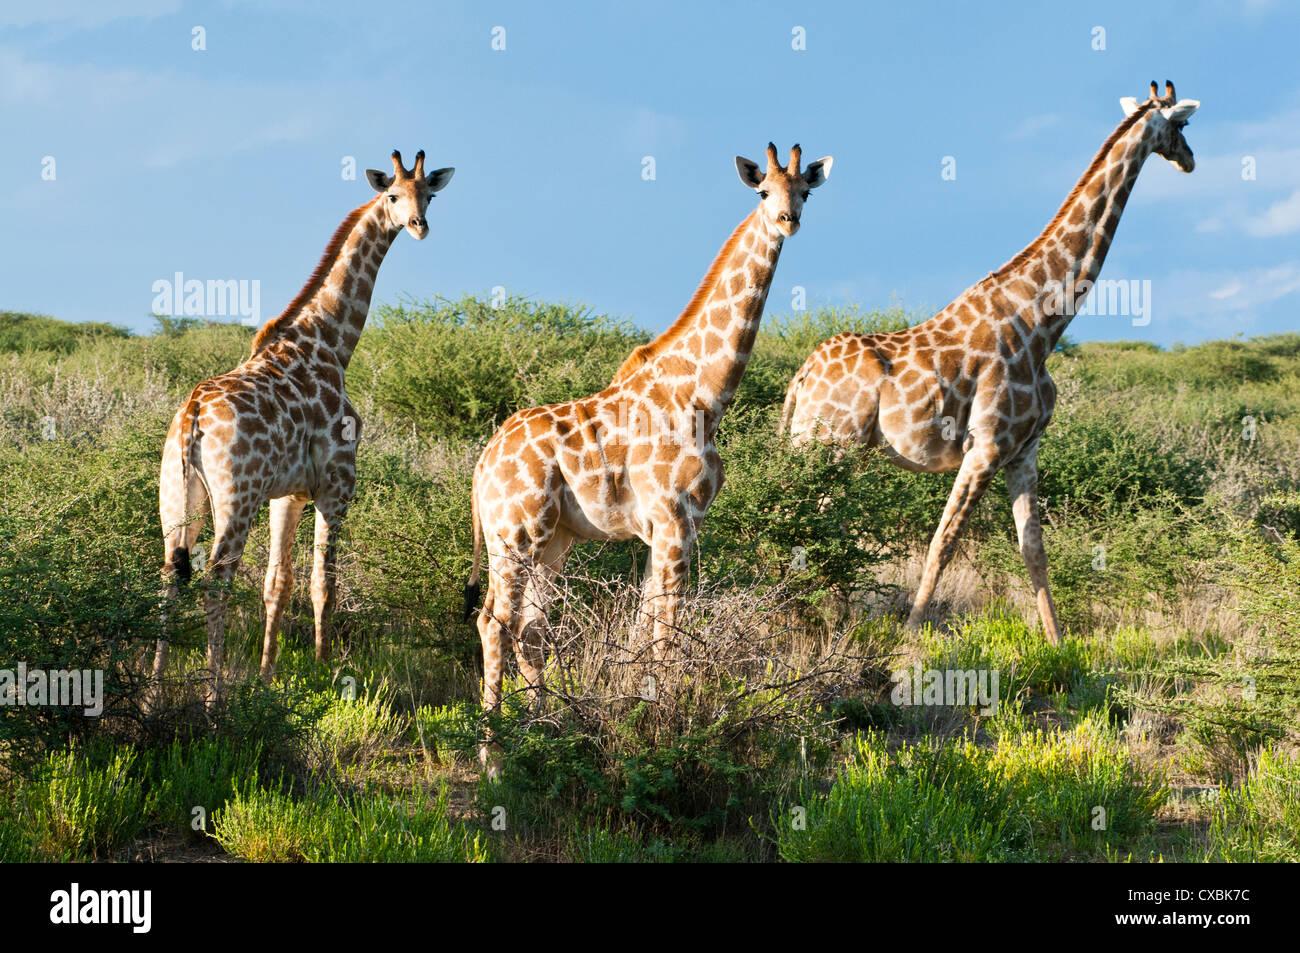 Giraffe (Giraffa camelopardalis), Namibia, Africa - Stock Image